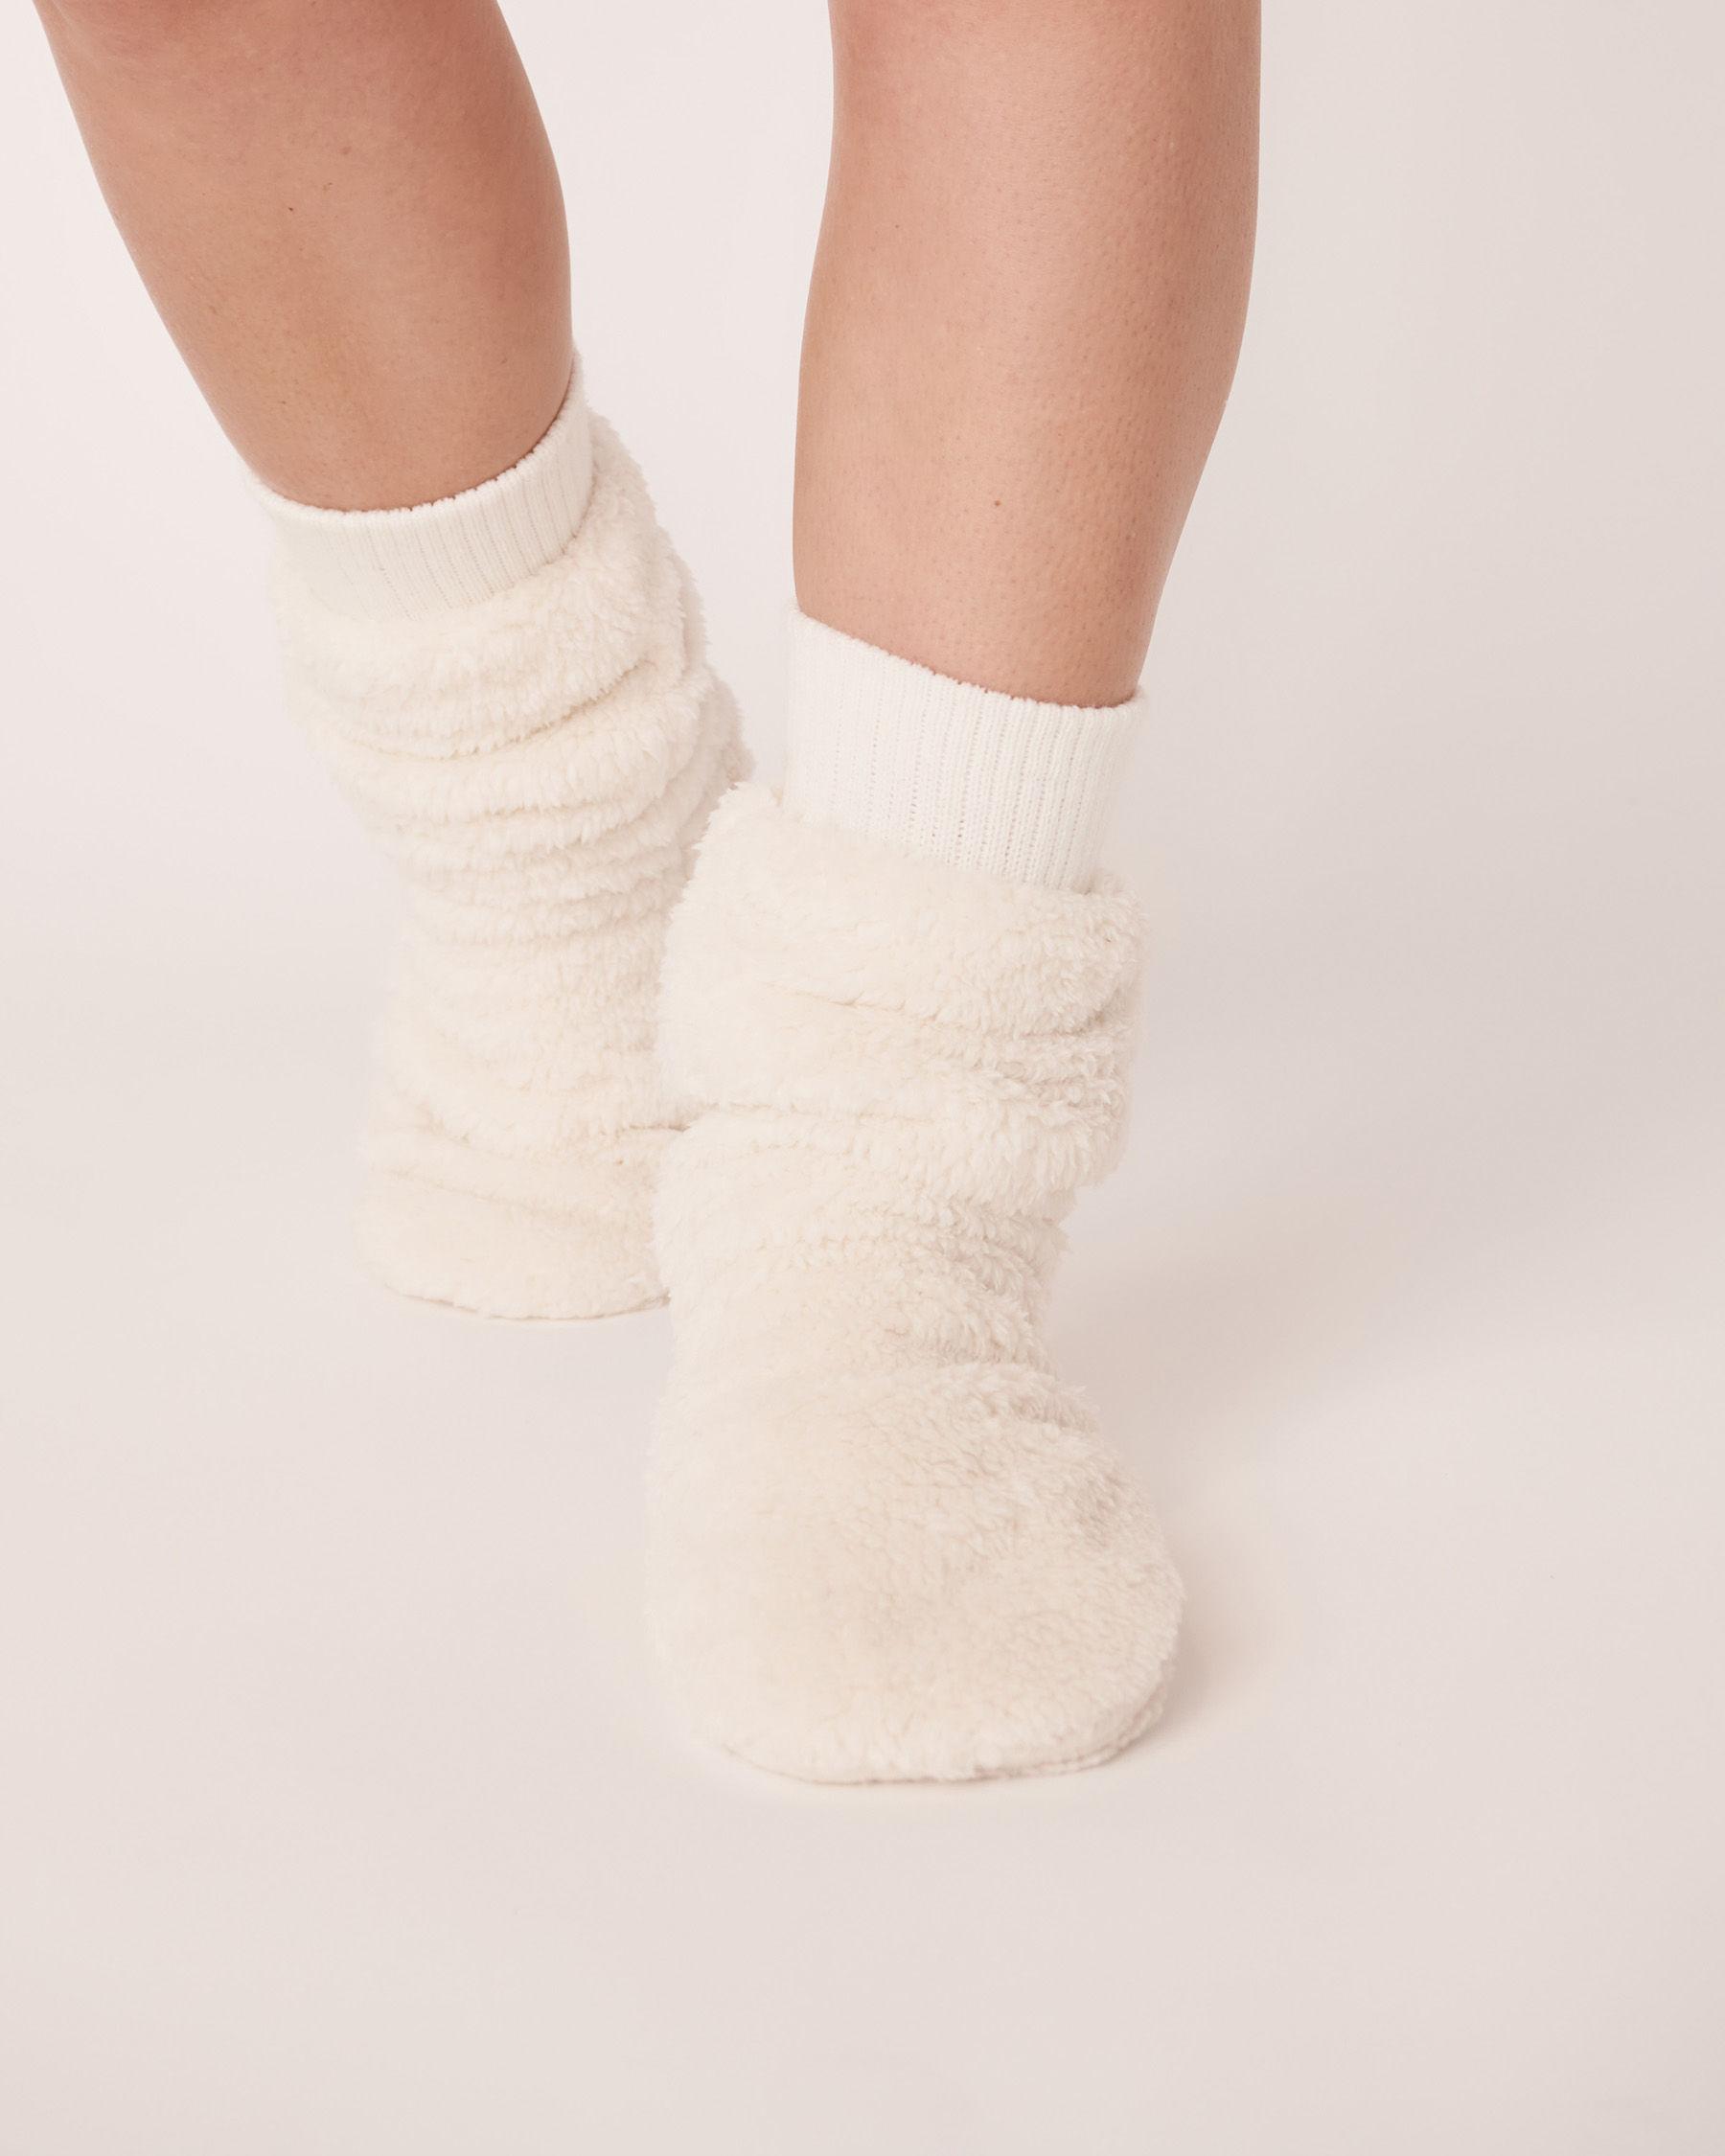 LA VIE EN ROSE Plush Mid Length Socks White 40700050 - View3